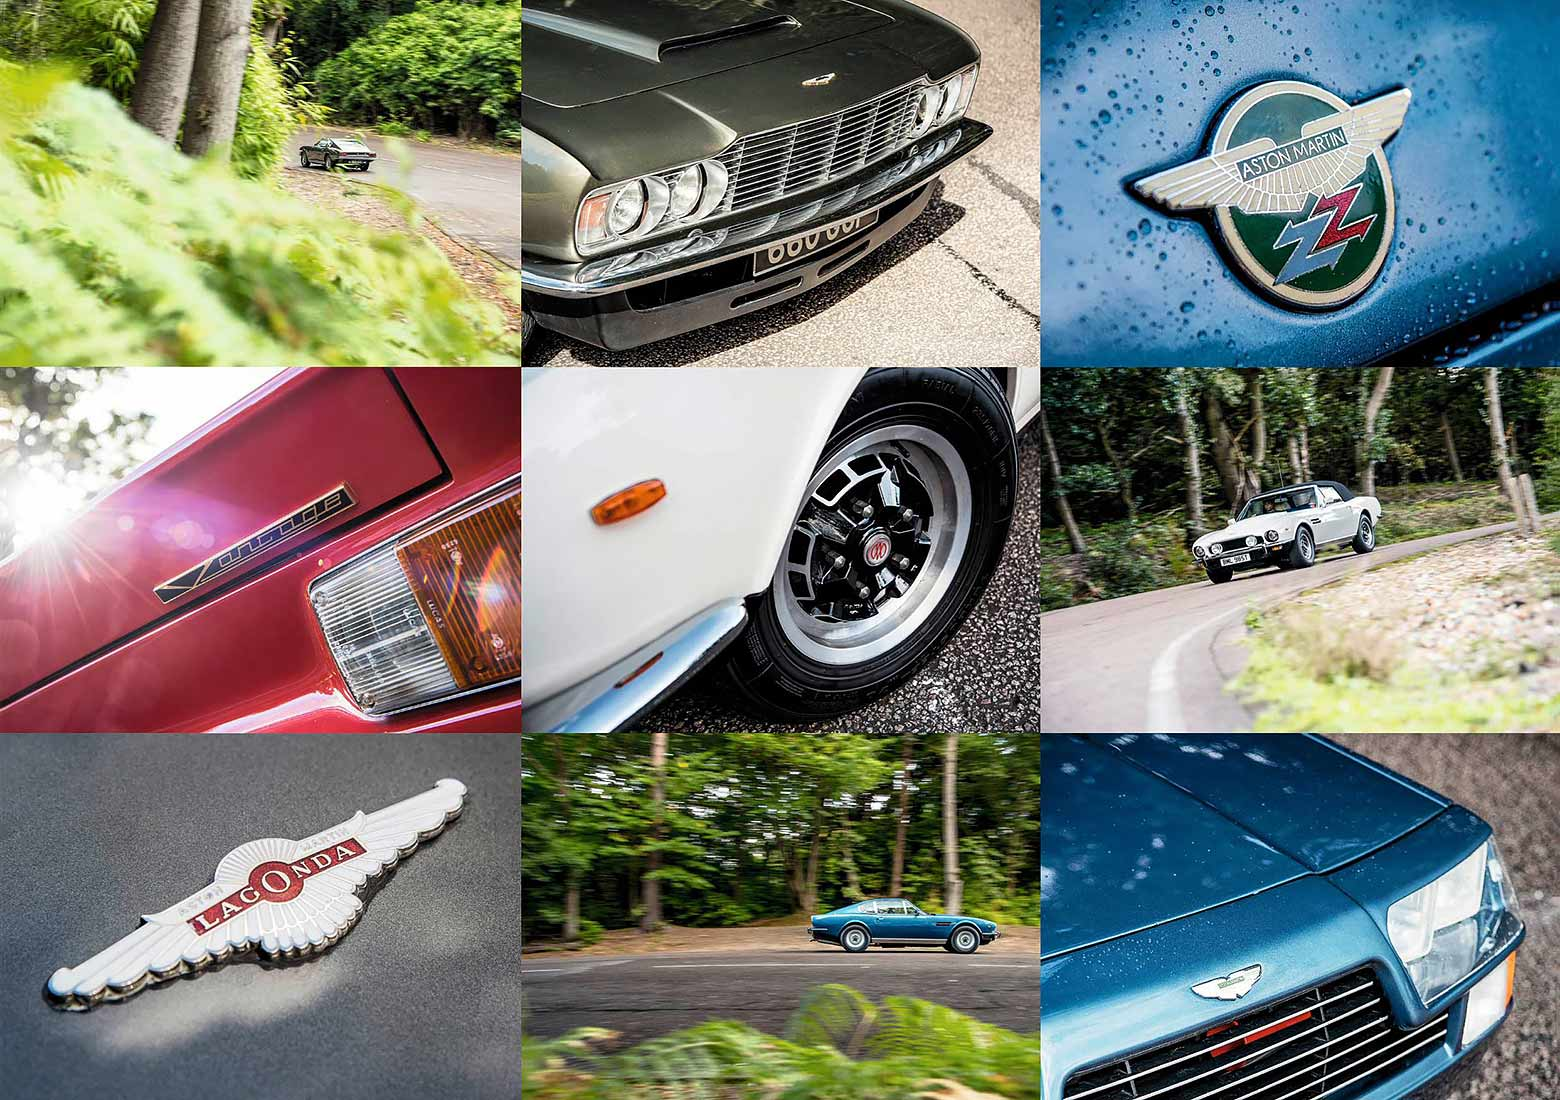 Aston-Martin-DBS-at-50